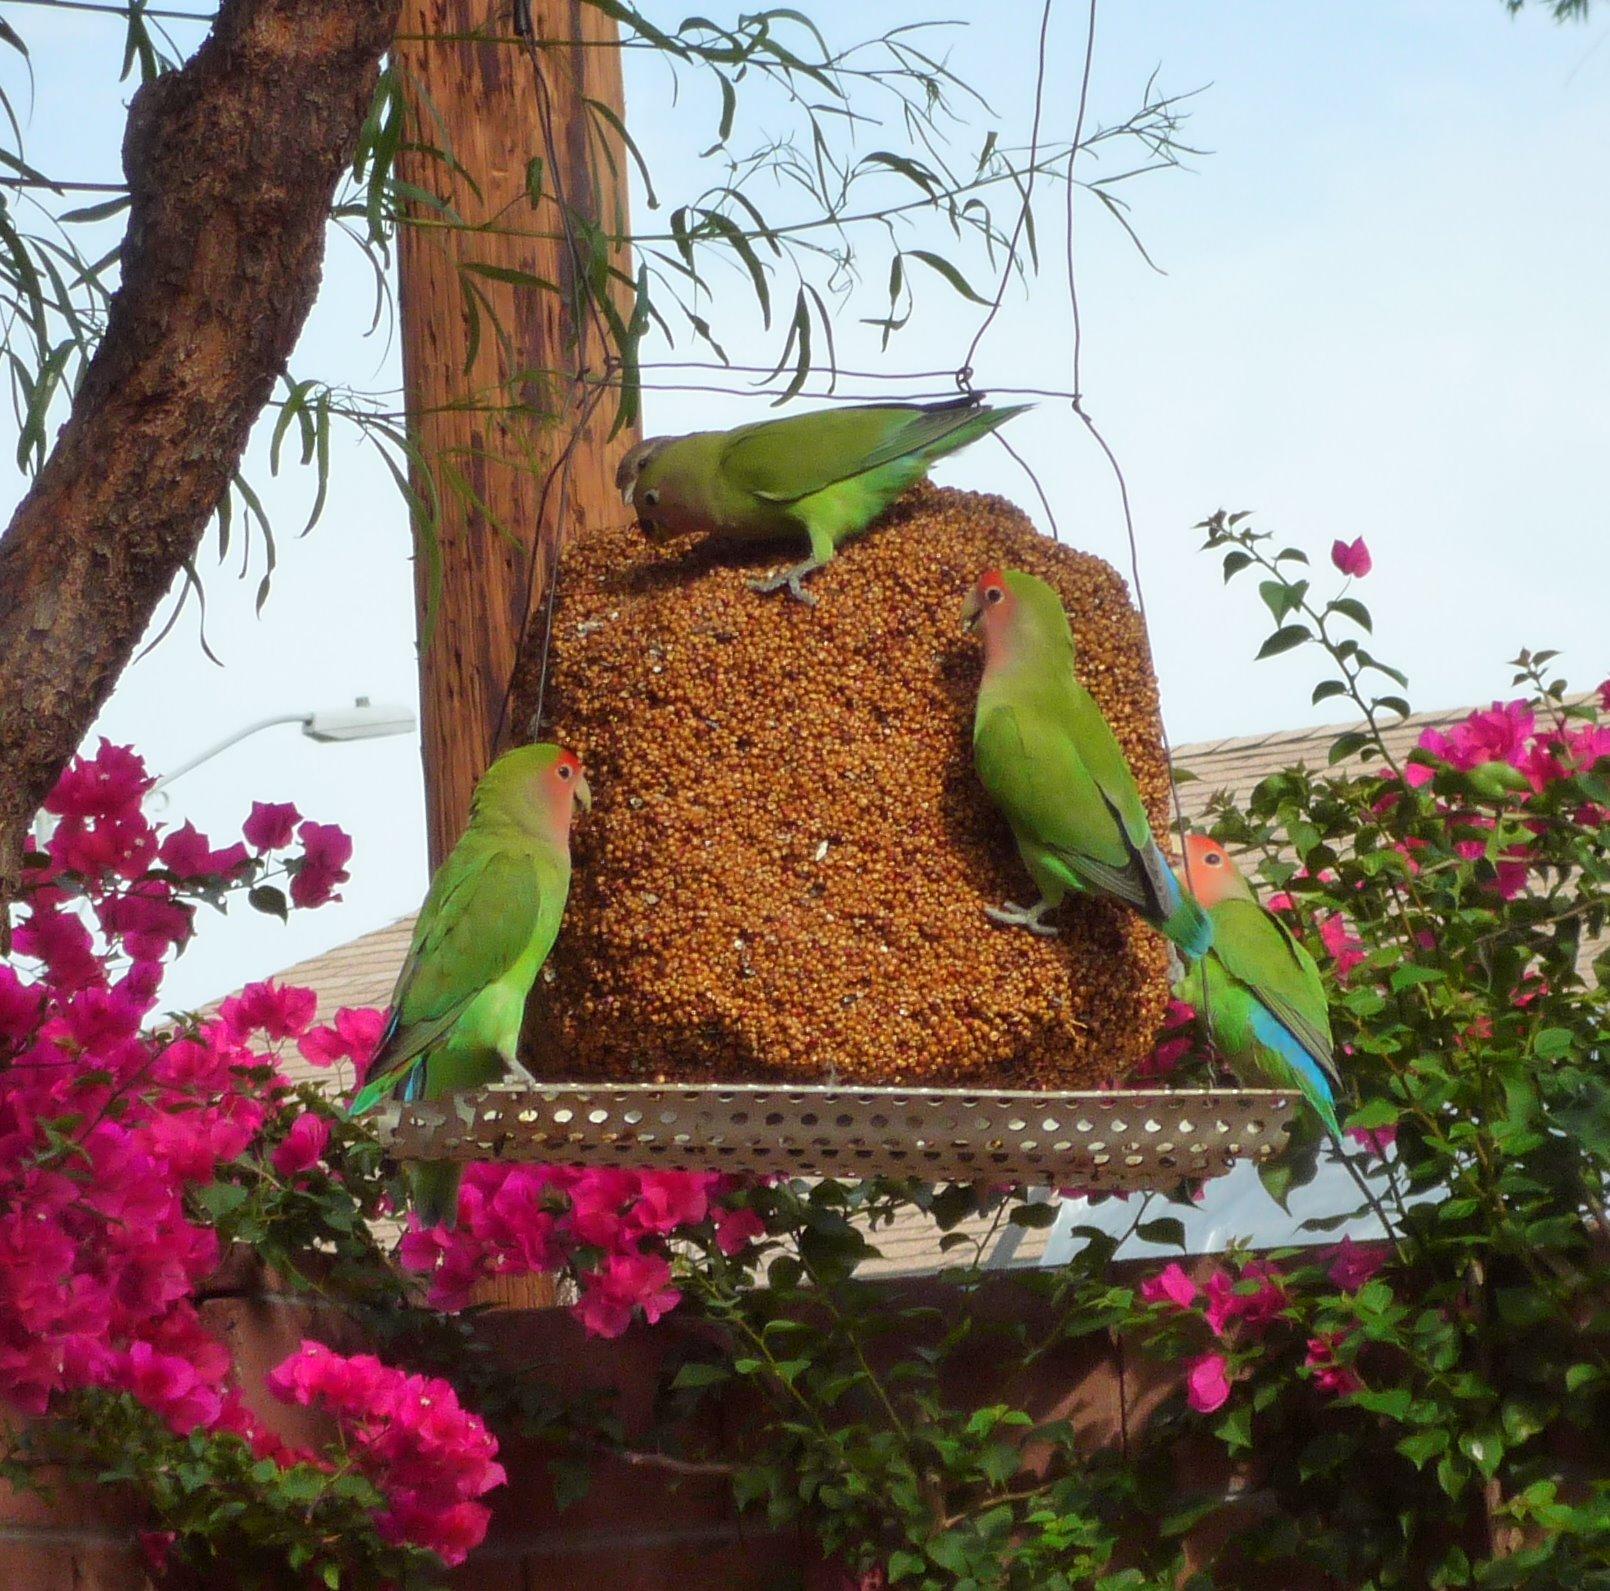 Agapornis_roseicollis_-Arizona_-garden_bird_feeder-8.jpg